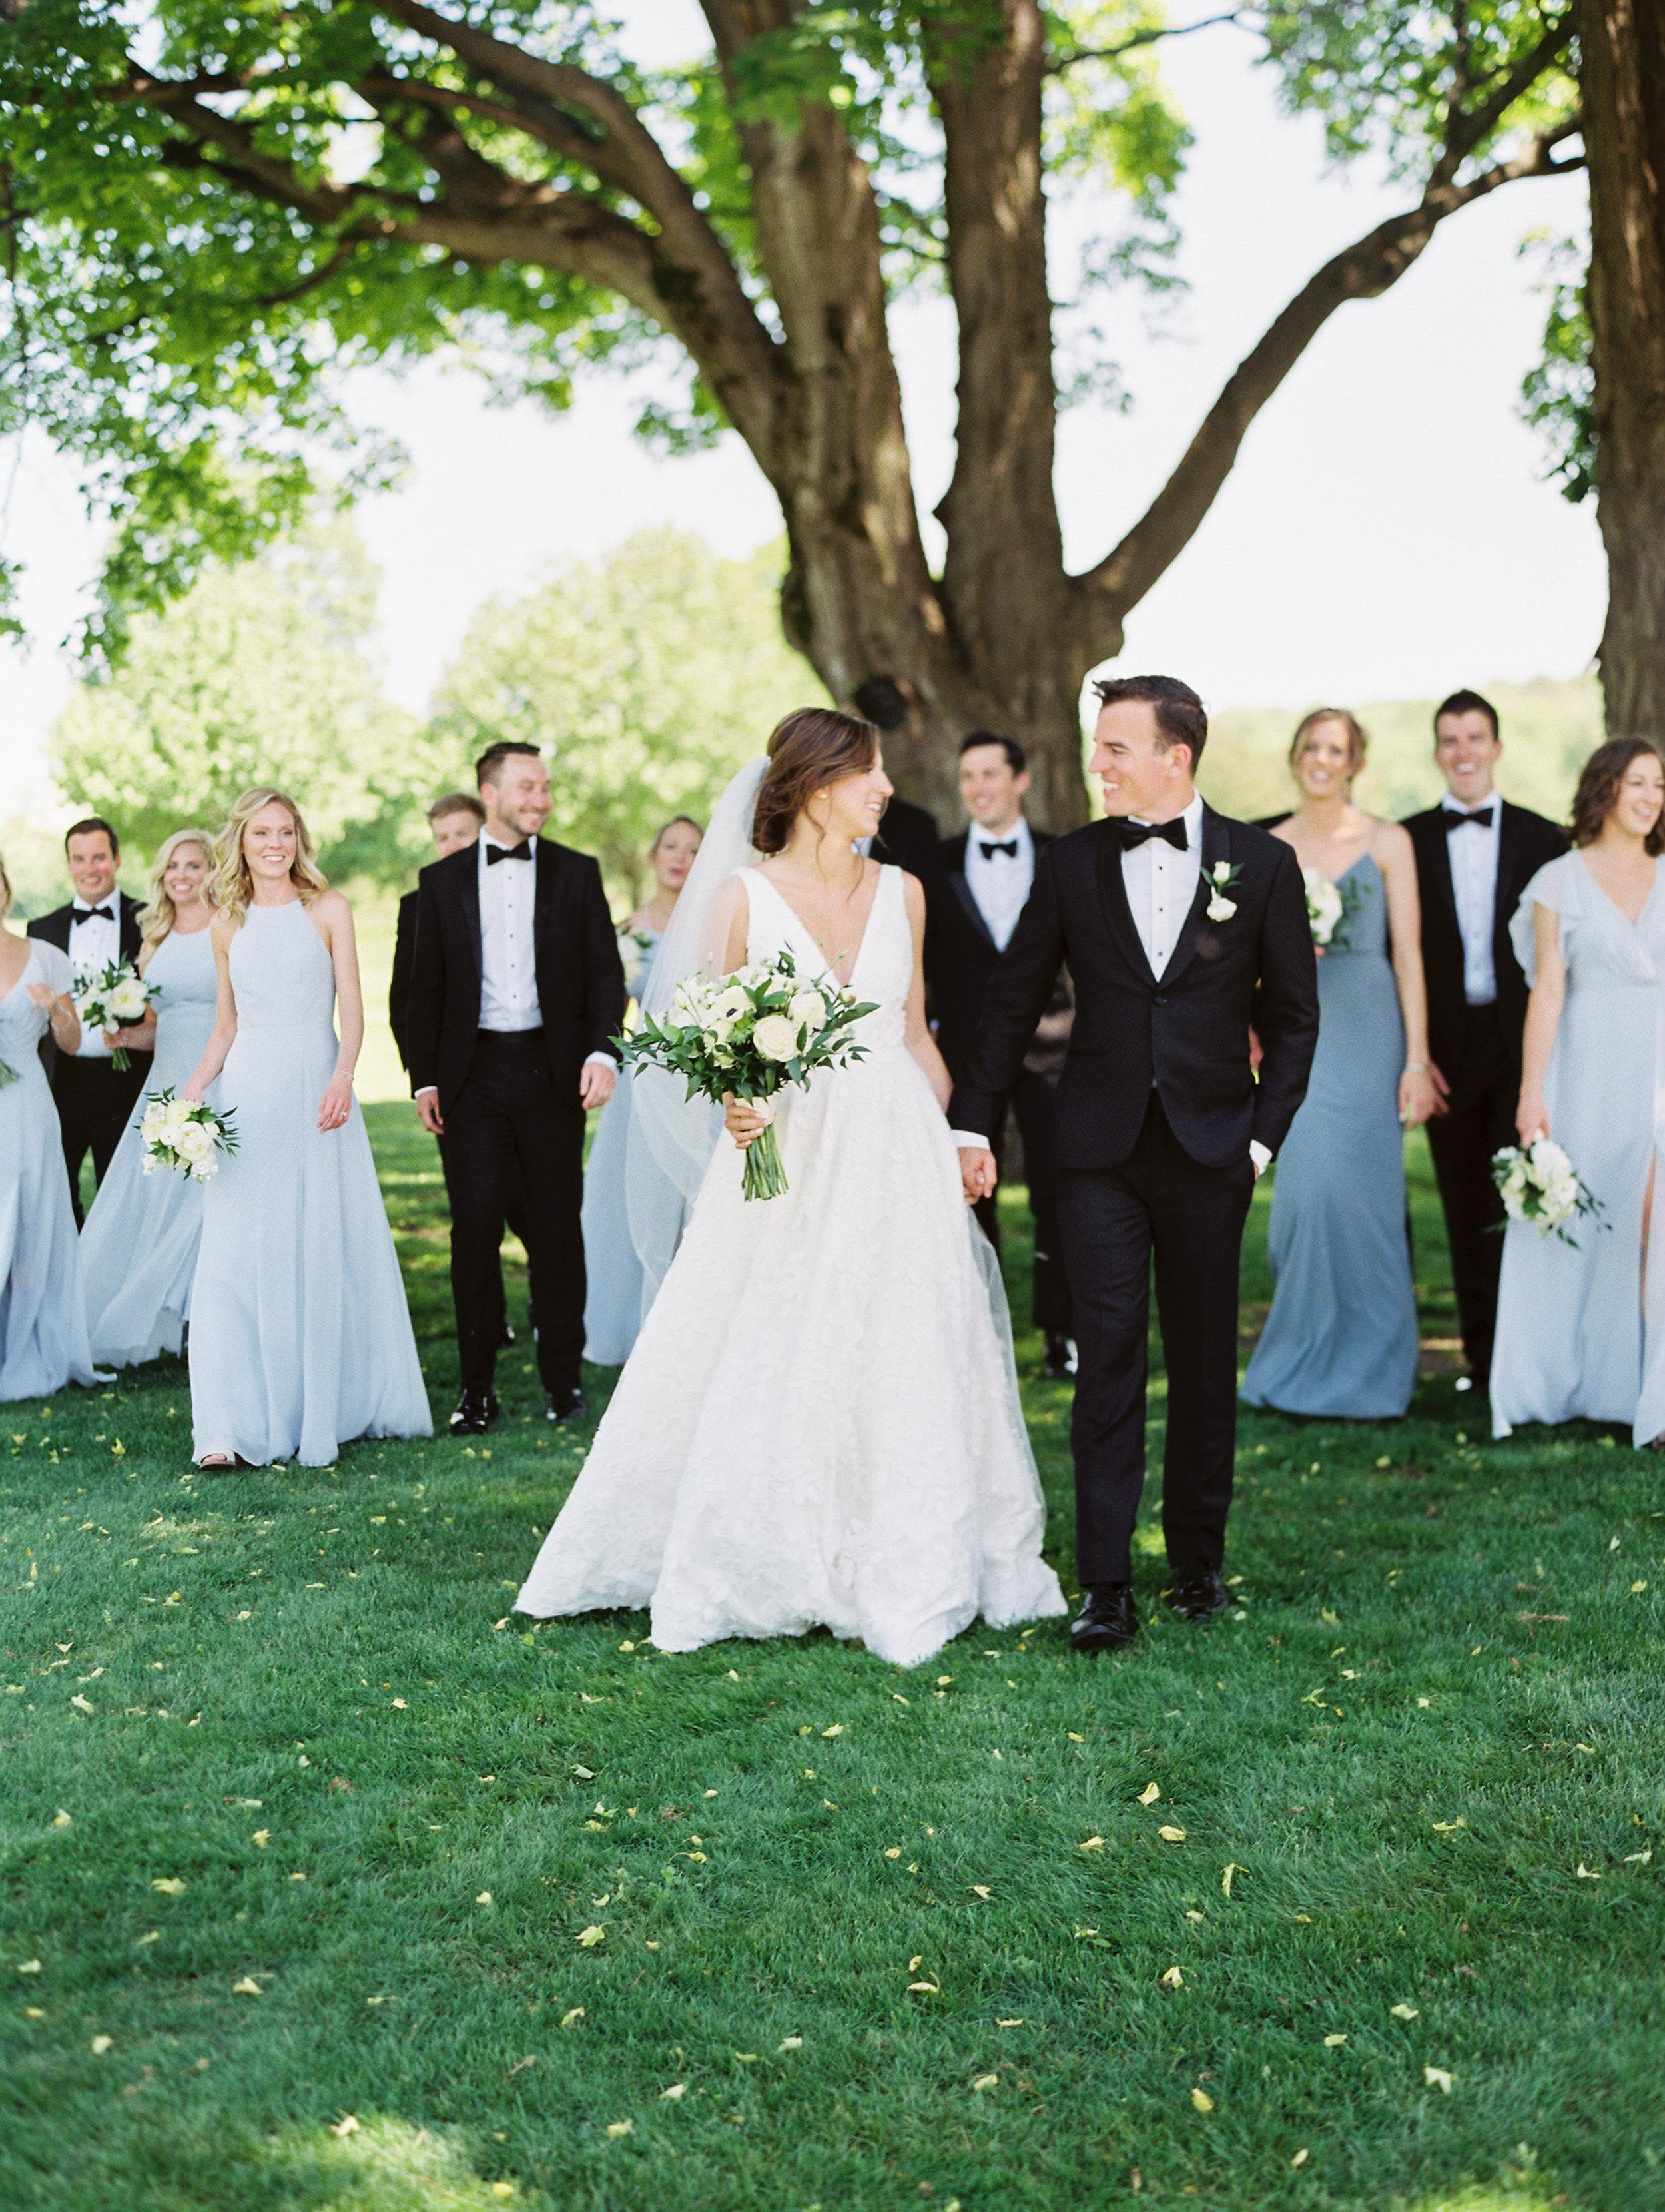 DeGuilio+Wedding+Bridal+Partyf-92.jpg